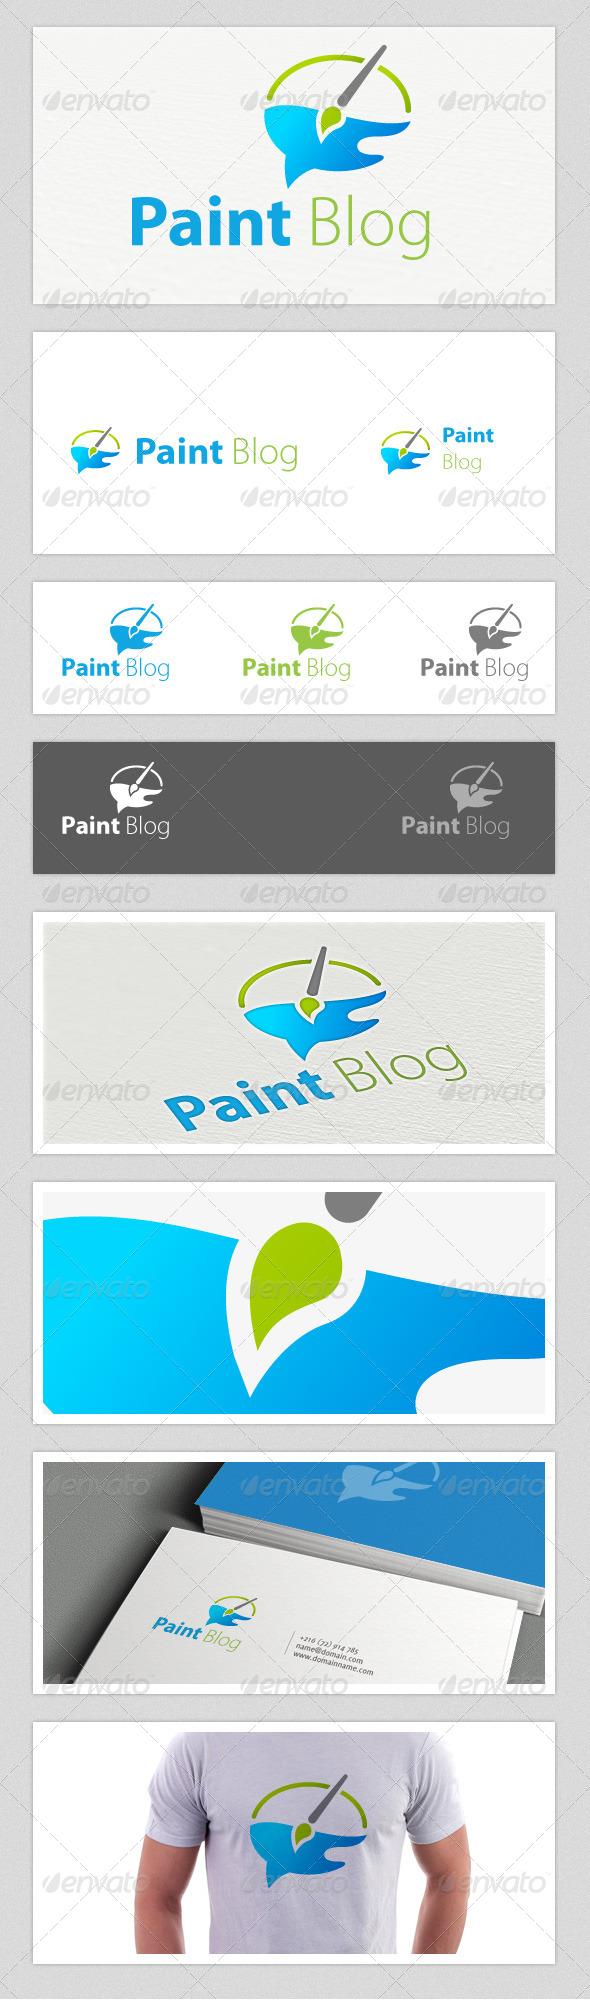 Paint Blog Logo - Abstract Logo Templates